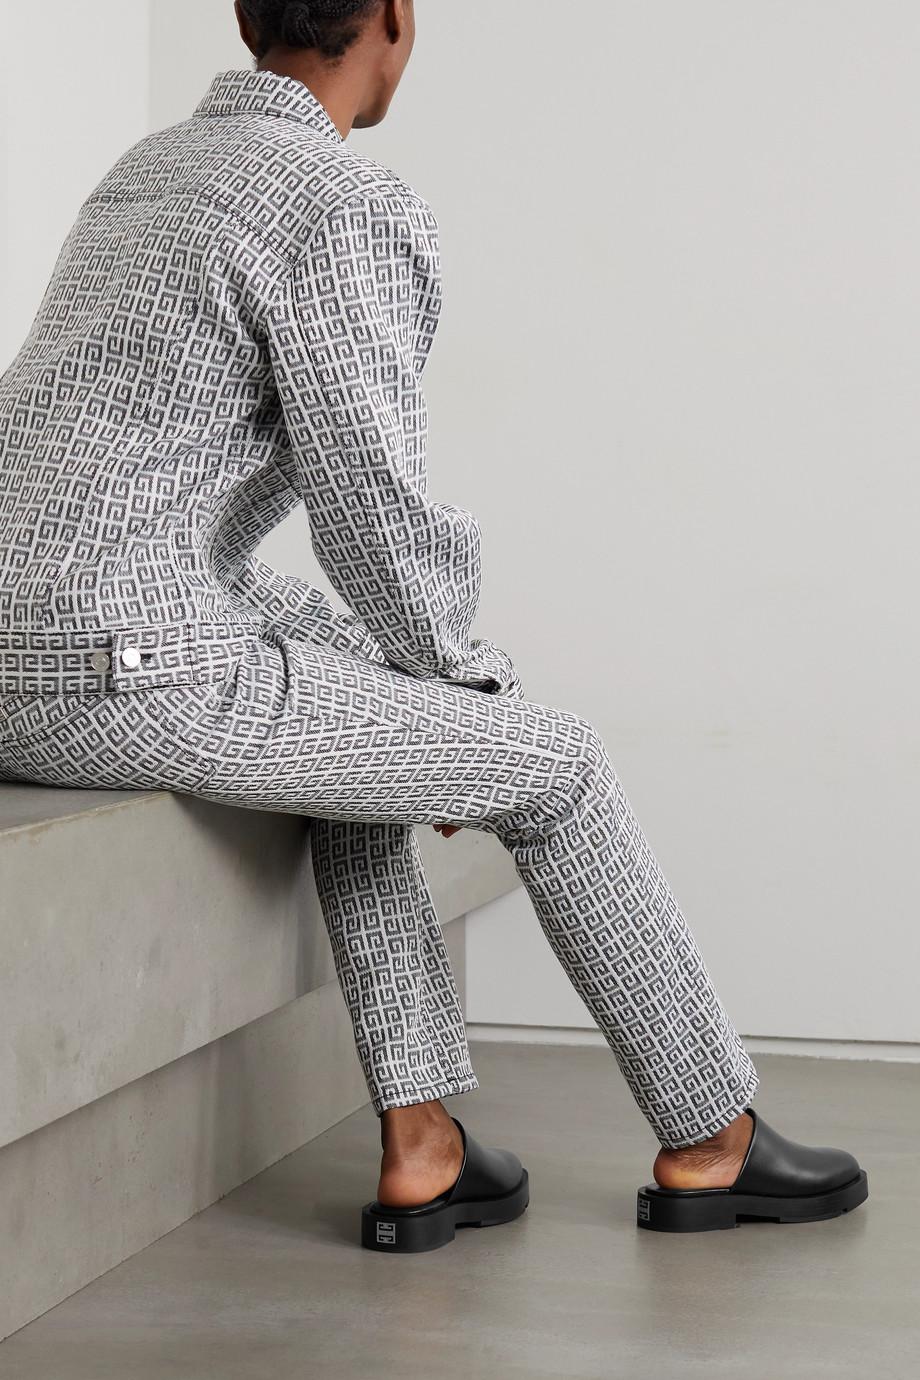 Givenchy Sabots en cuir